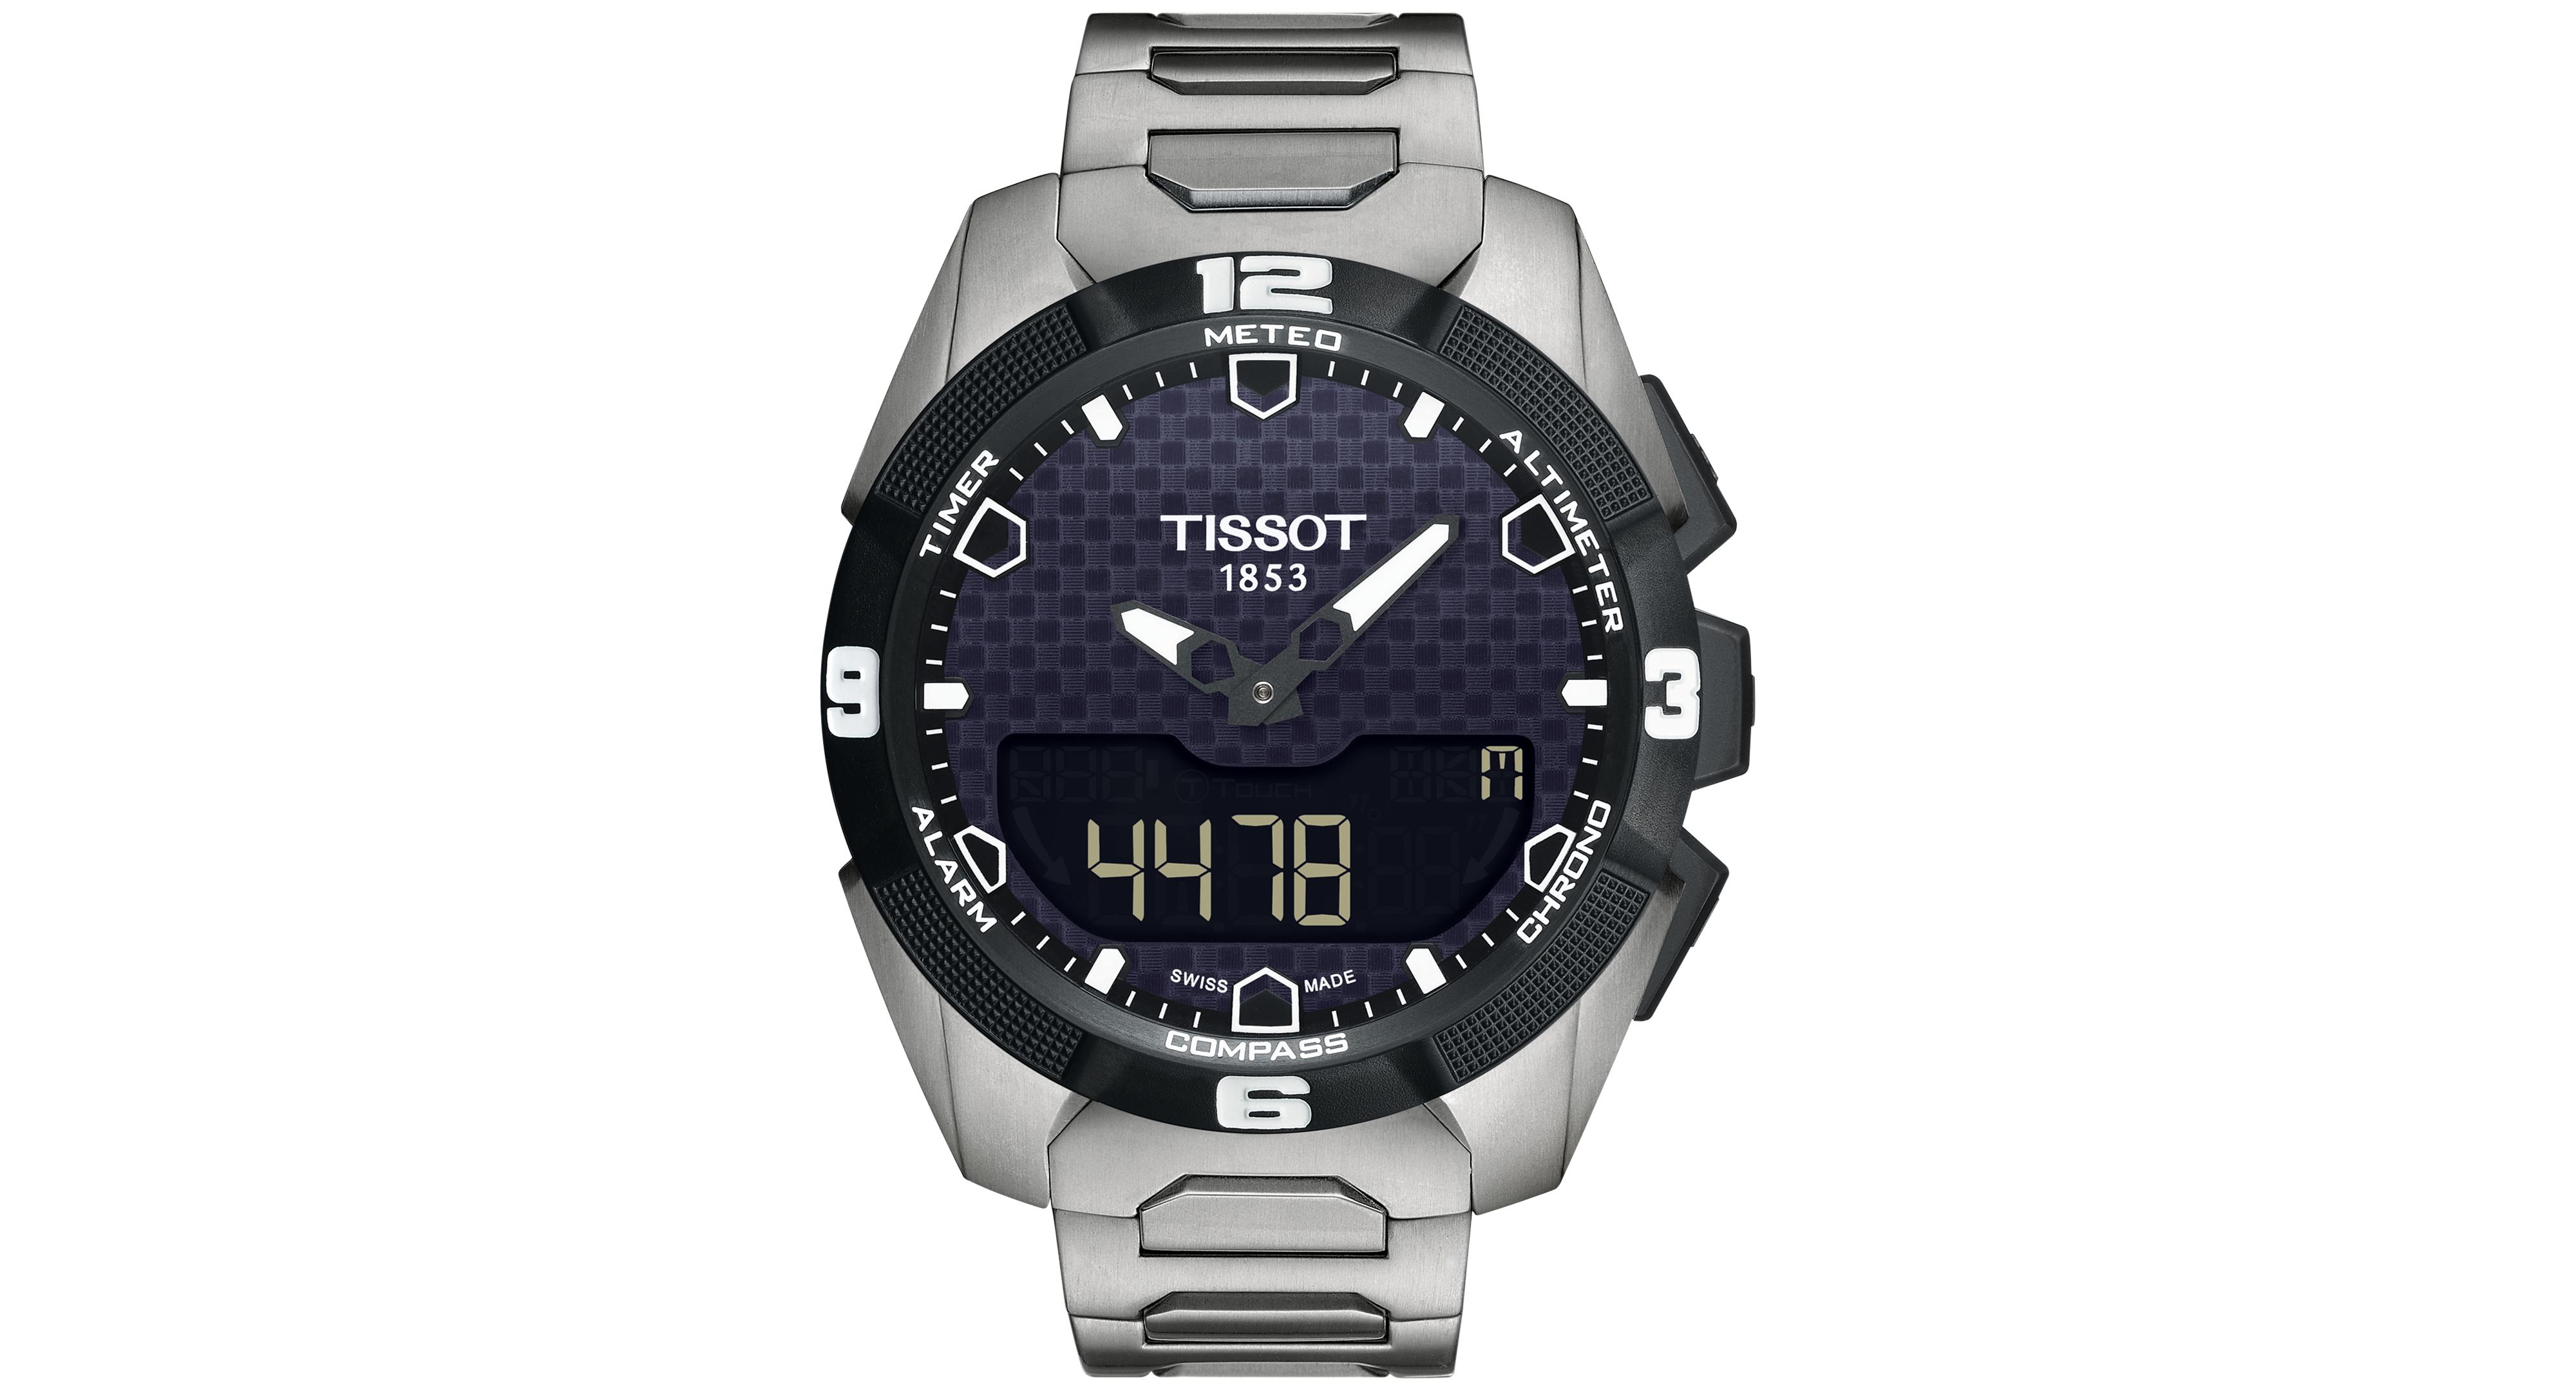 Men S Swiss Analog Digital T Touch Expert Solar Titanium Bracelet Watch 45mm T0914204405100 Tissot T Touch Watches For Men Best Watches For Men